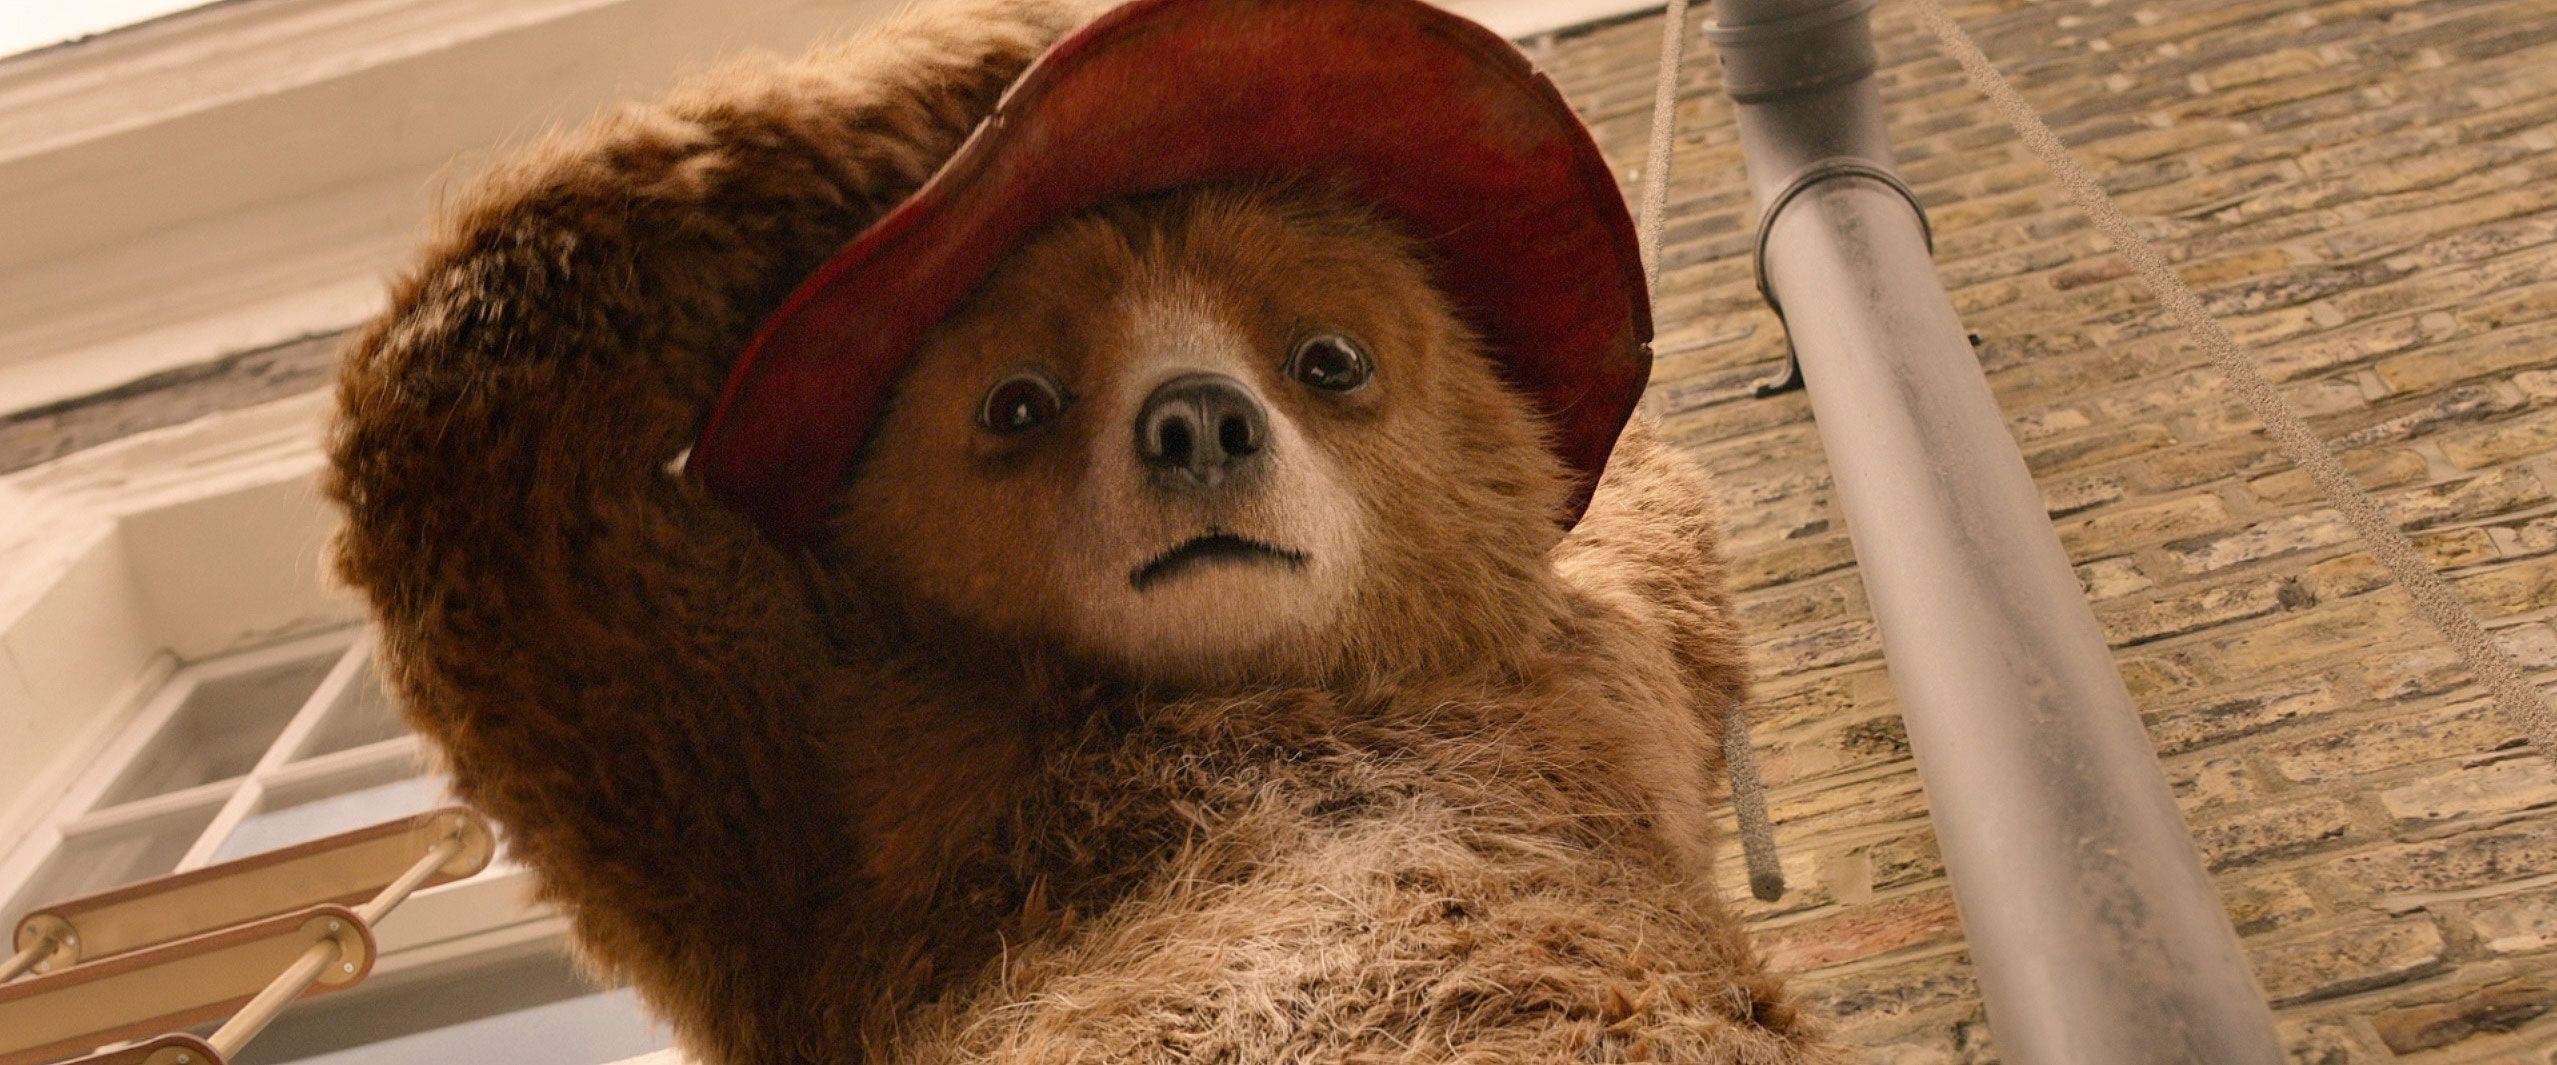 Paddington 3 release date, cast, plot